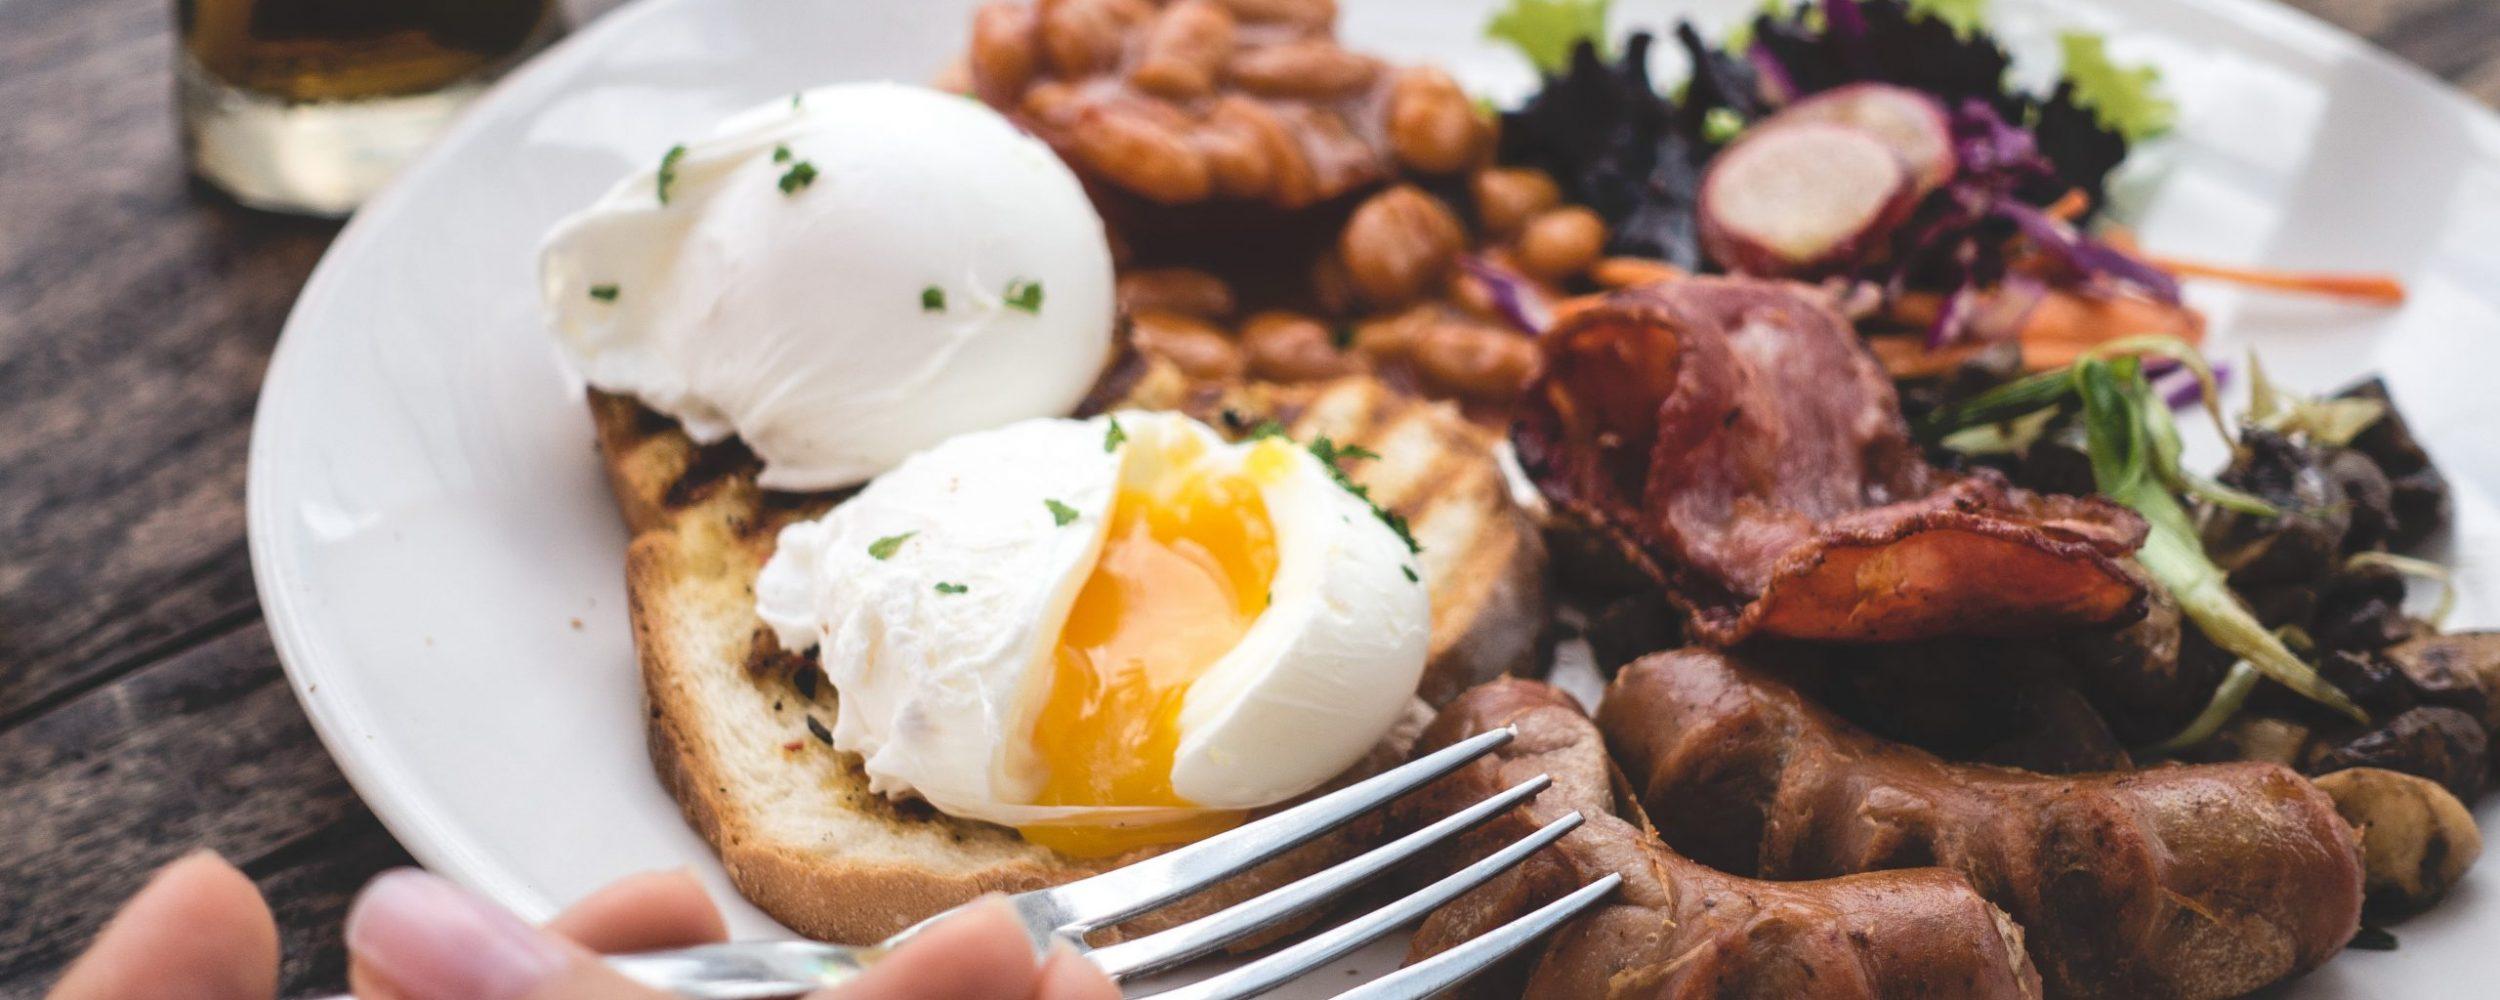 brunch-buffet-aeg-bacon-poelser-catering